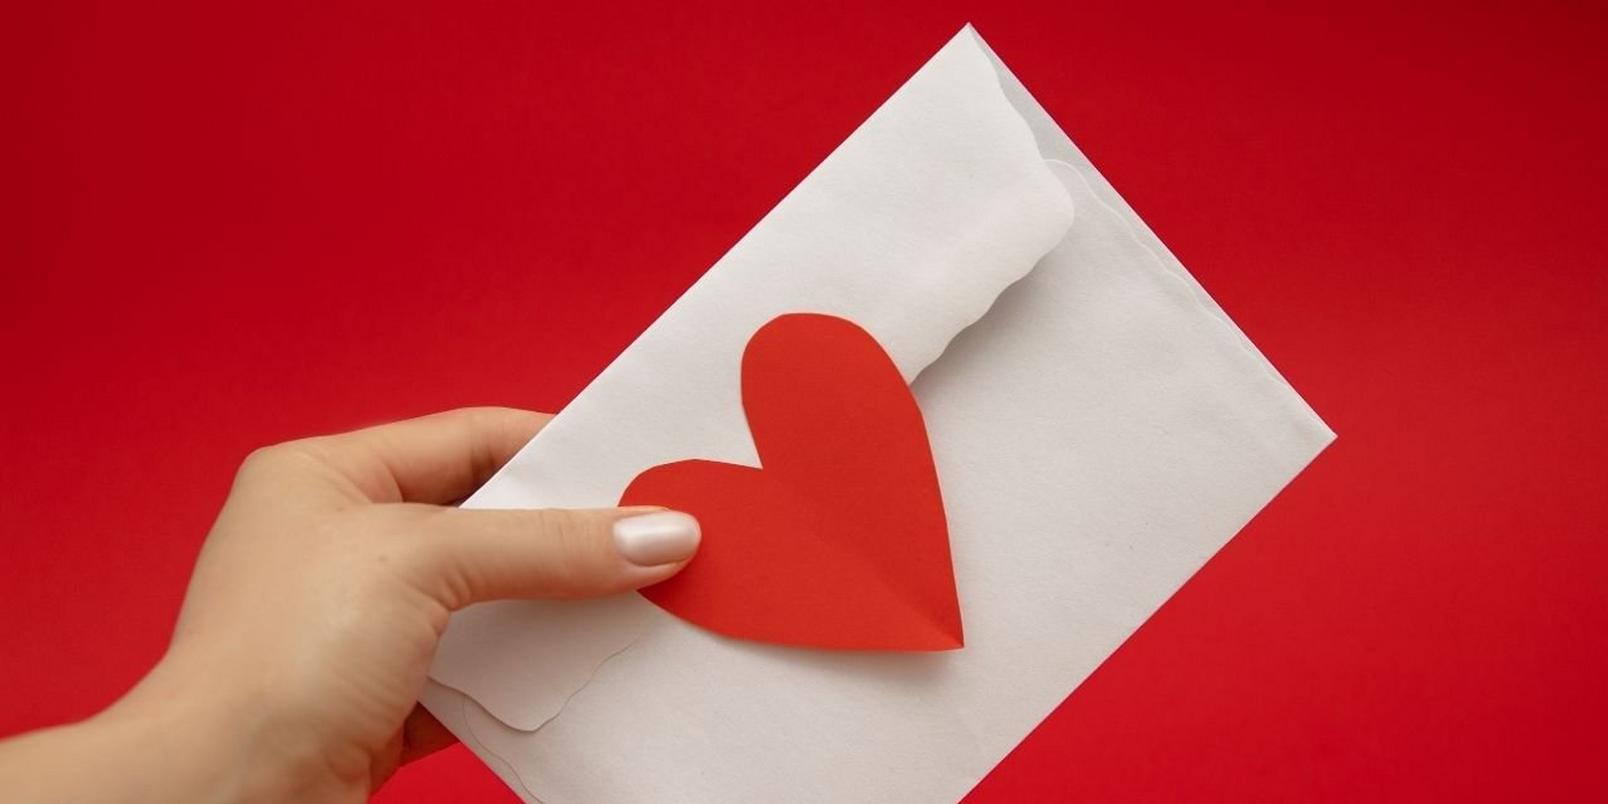 ideas-for-celebrating-valentines-day-in-lockdown-4